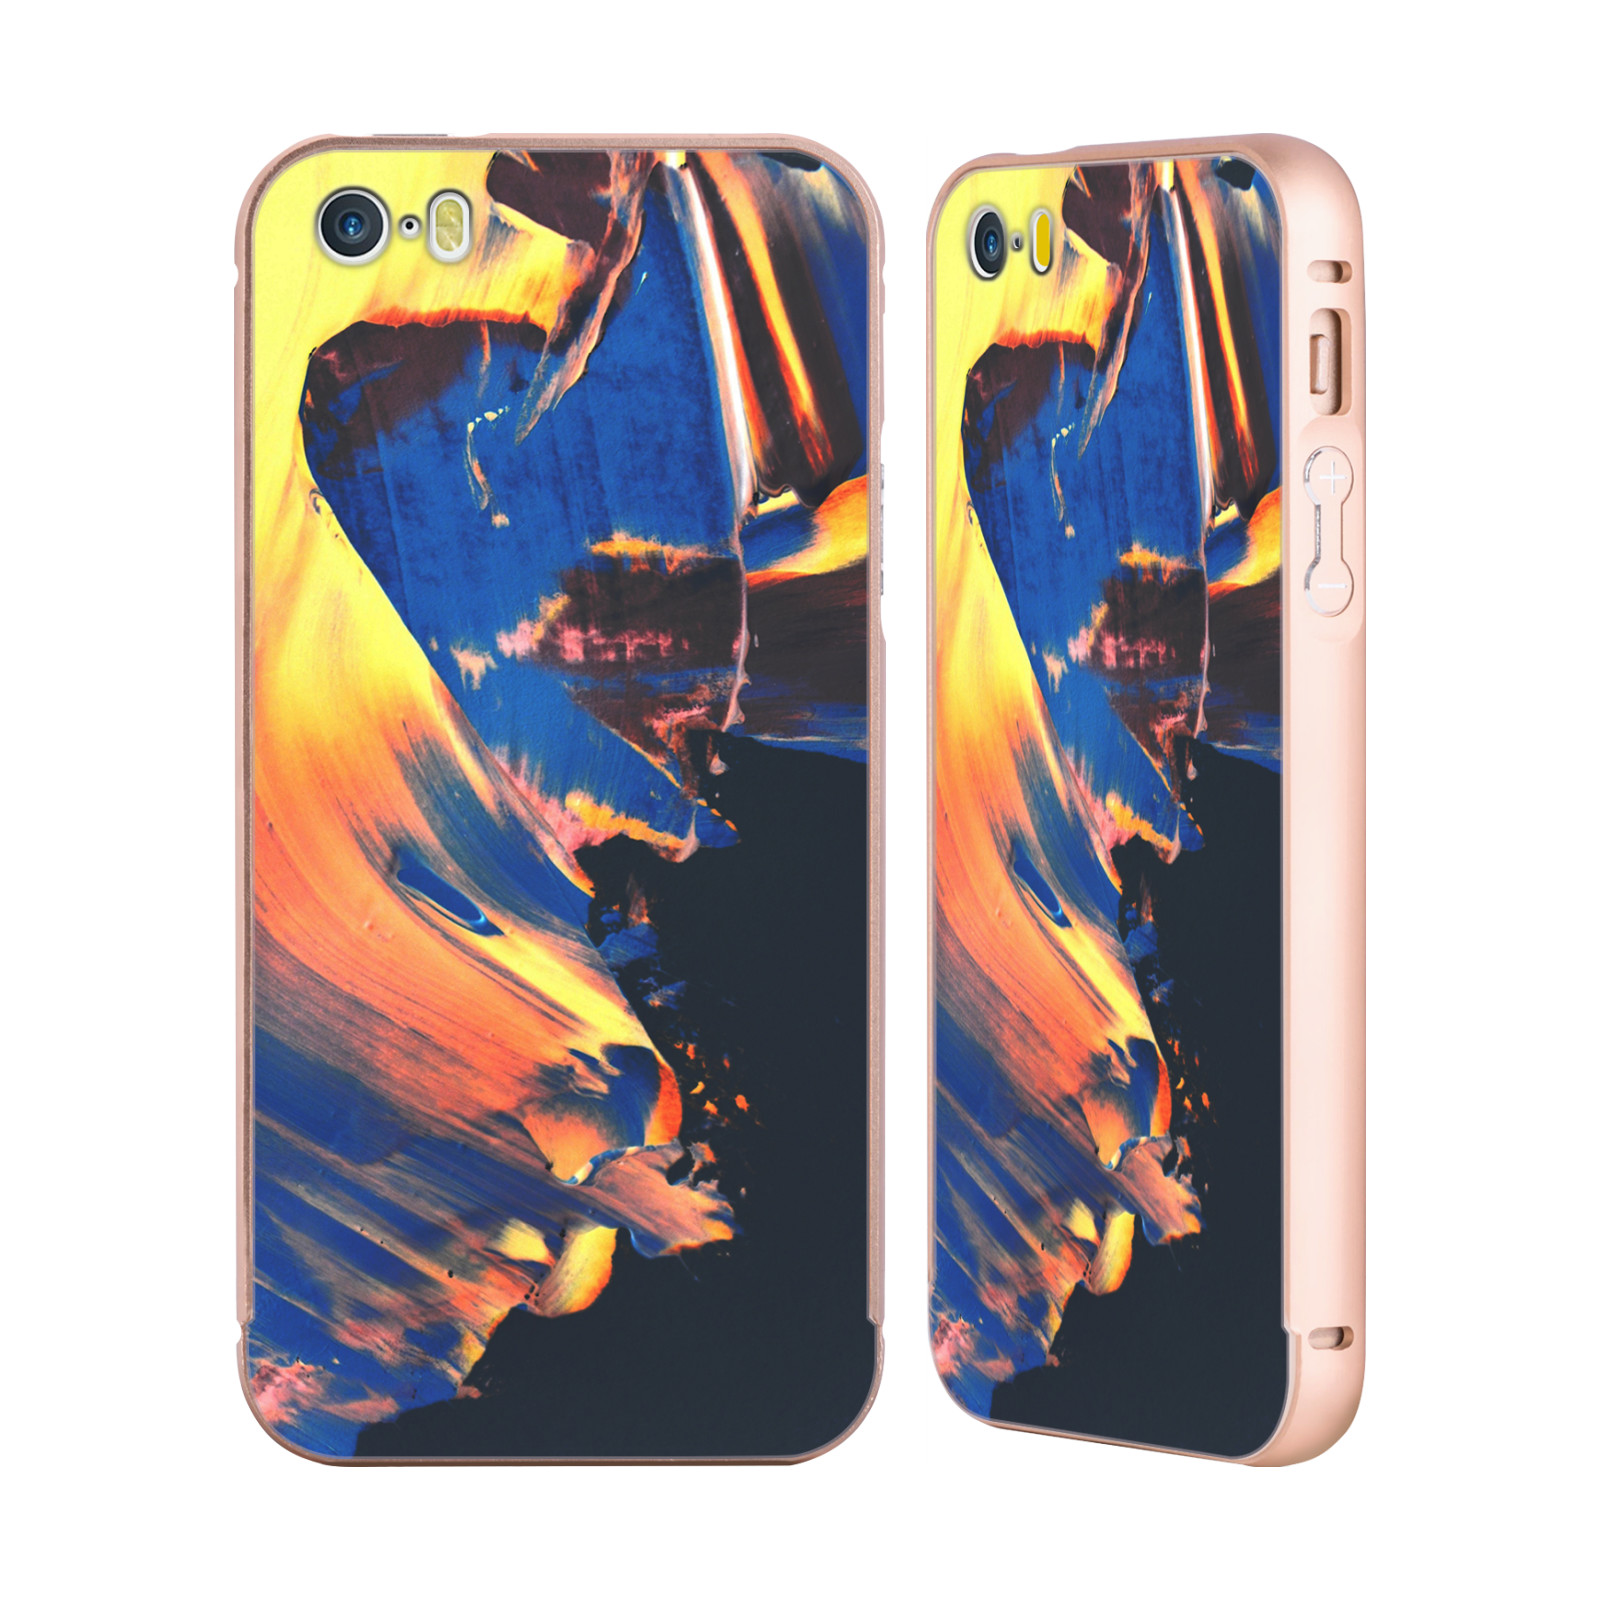 OFFIZIELLE-DJUNO-TOMSNI-ABSTRAKT-GOLD-RAHMEN-HULLE-FUR-APPLE-iPHONE-HANDYS